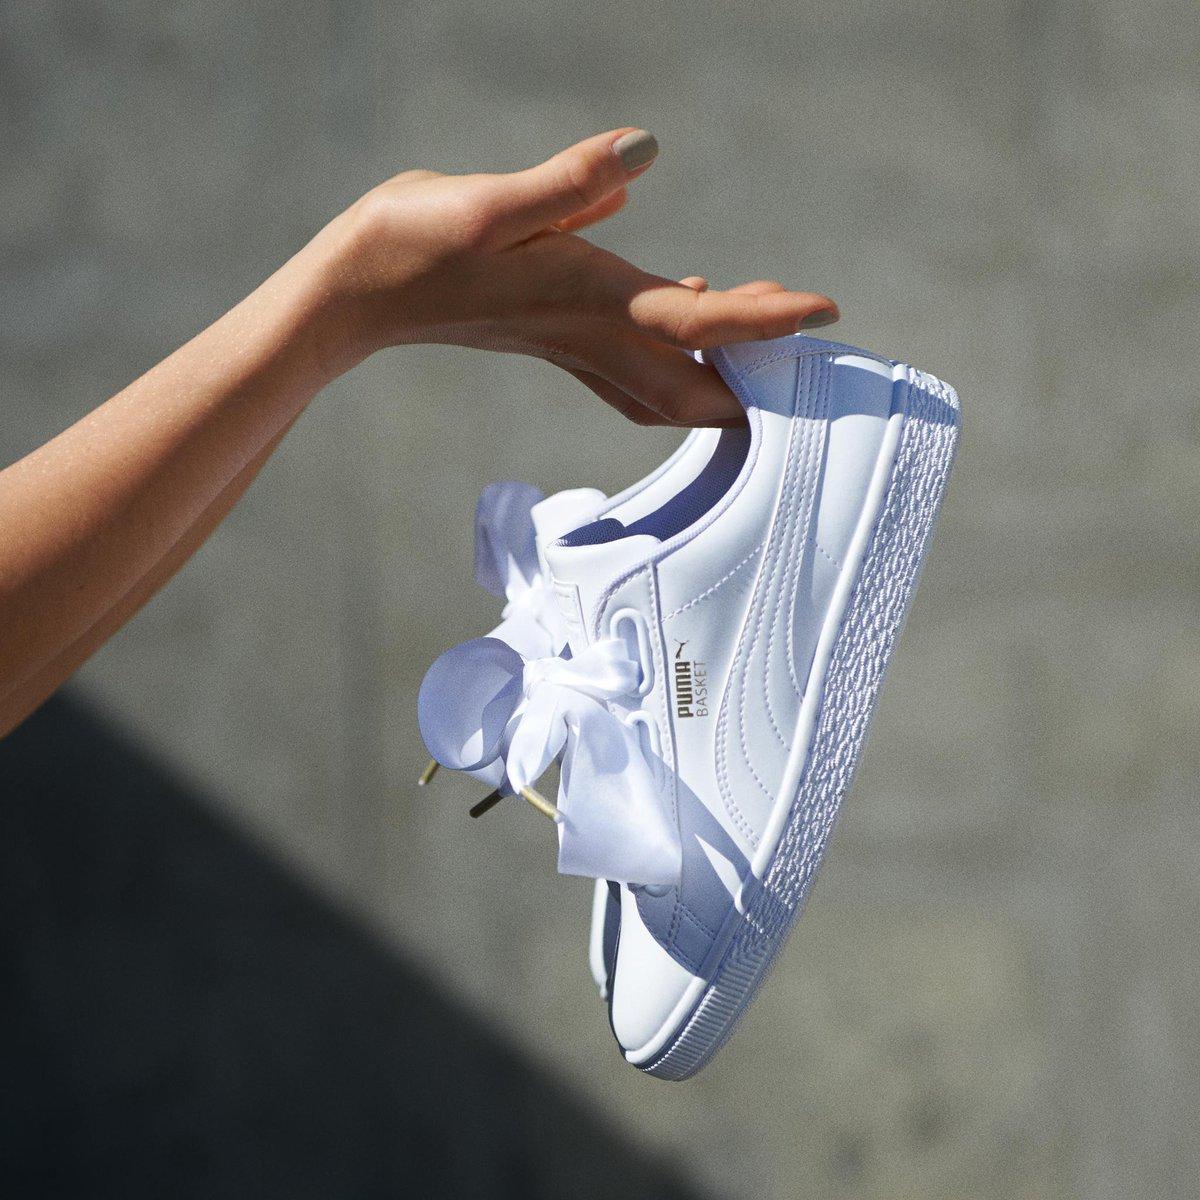 promo code d8cd5 e4051 OFFICE Shoes on Twitter: